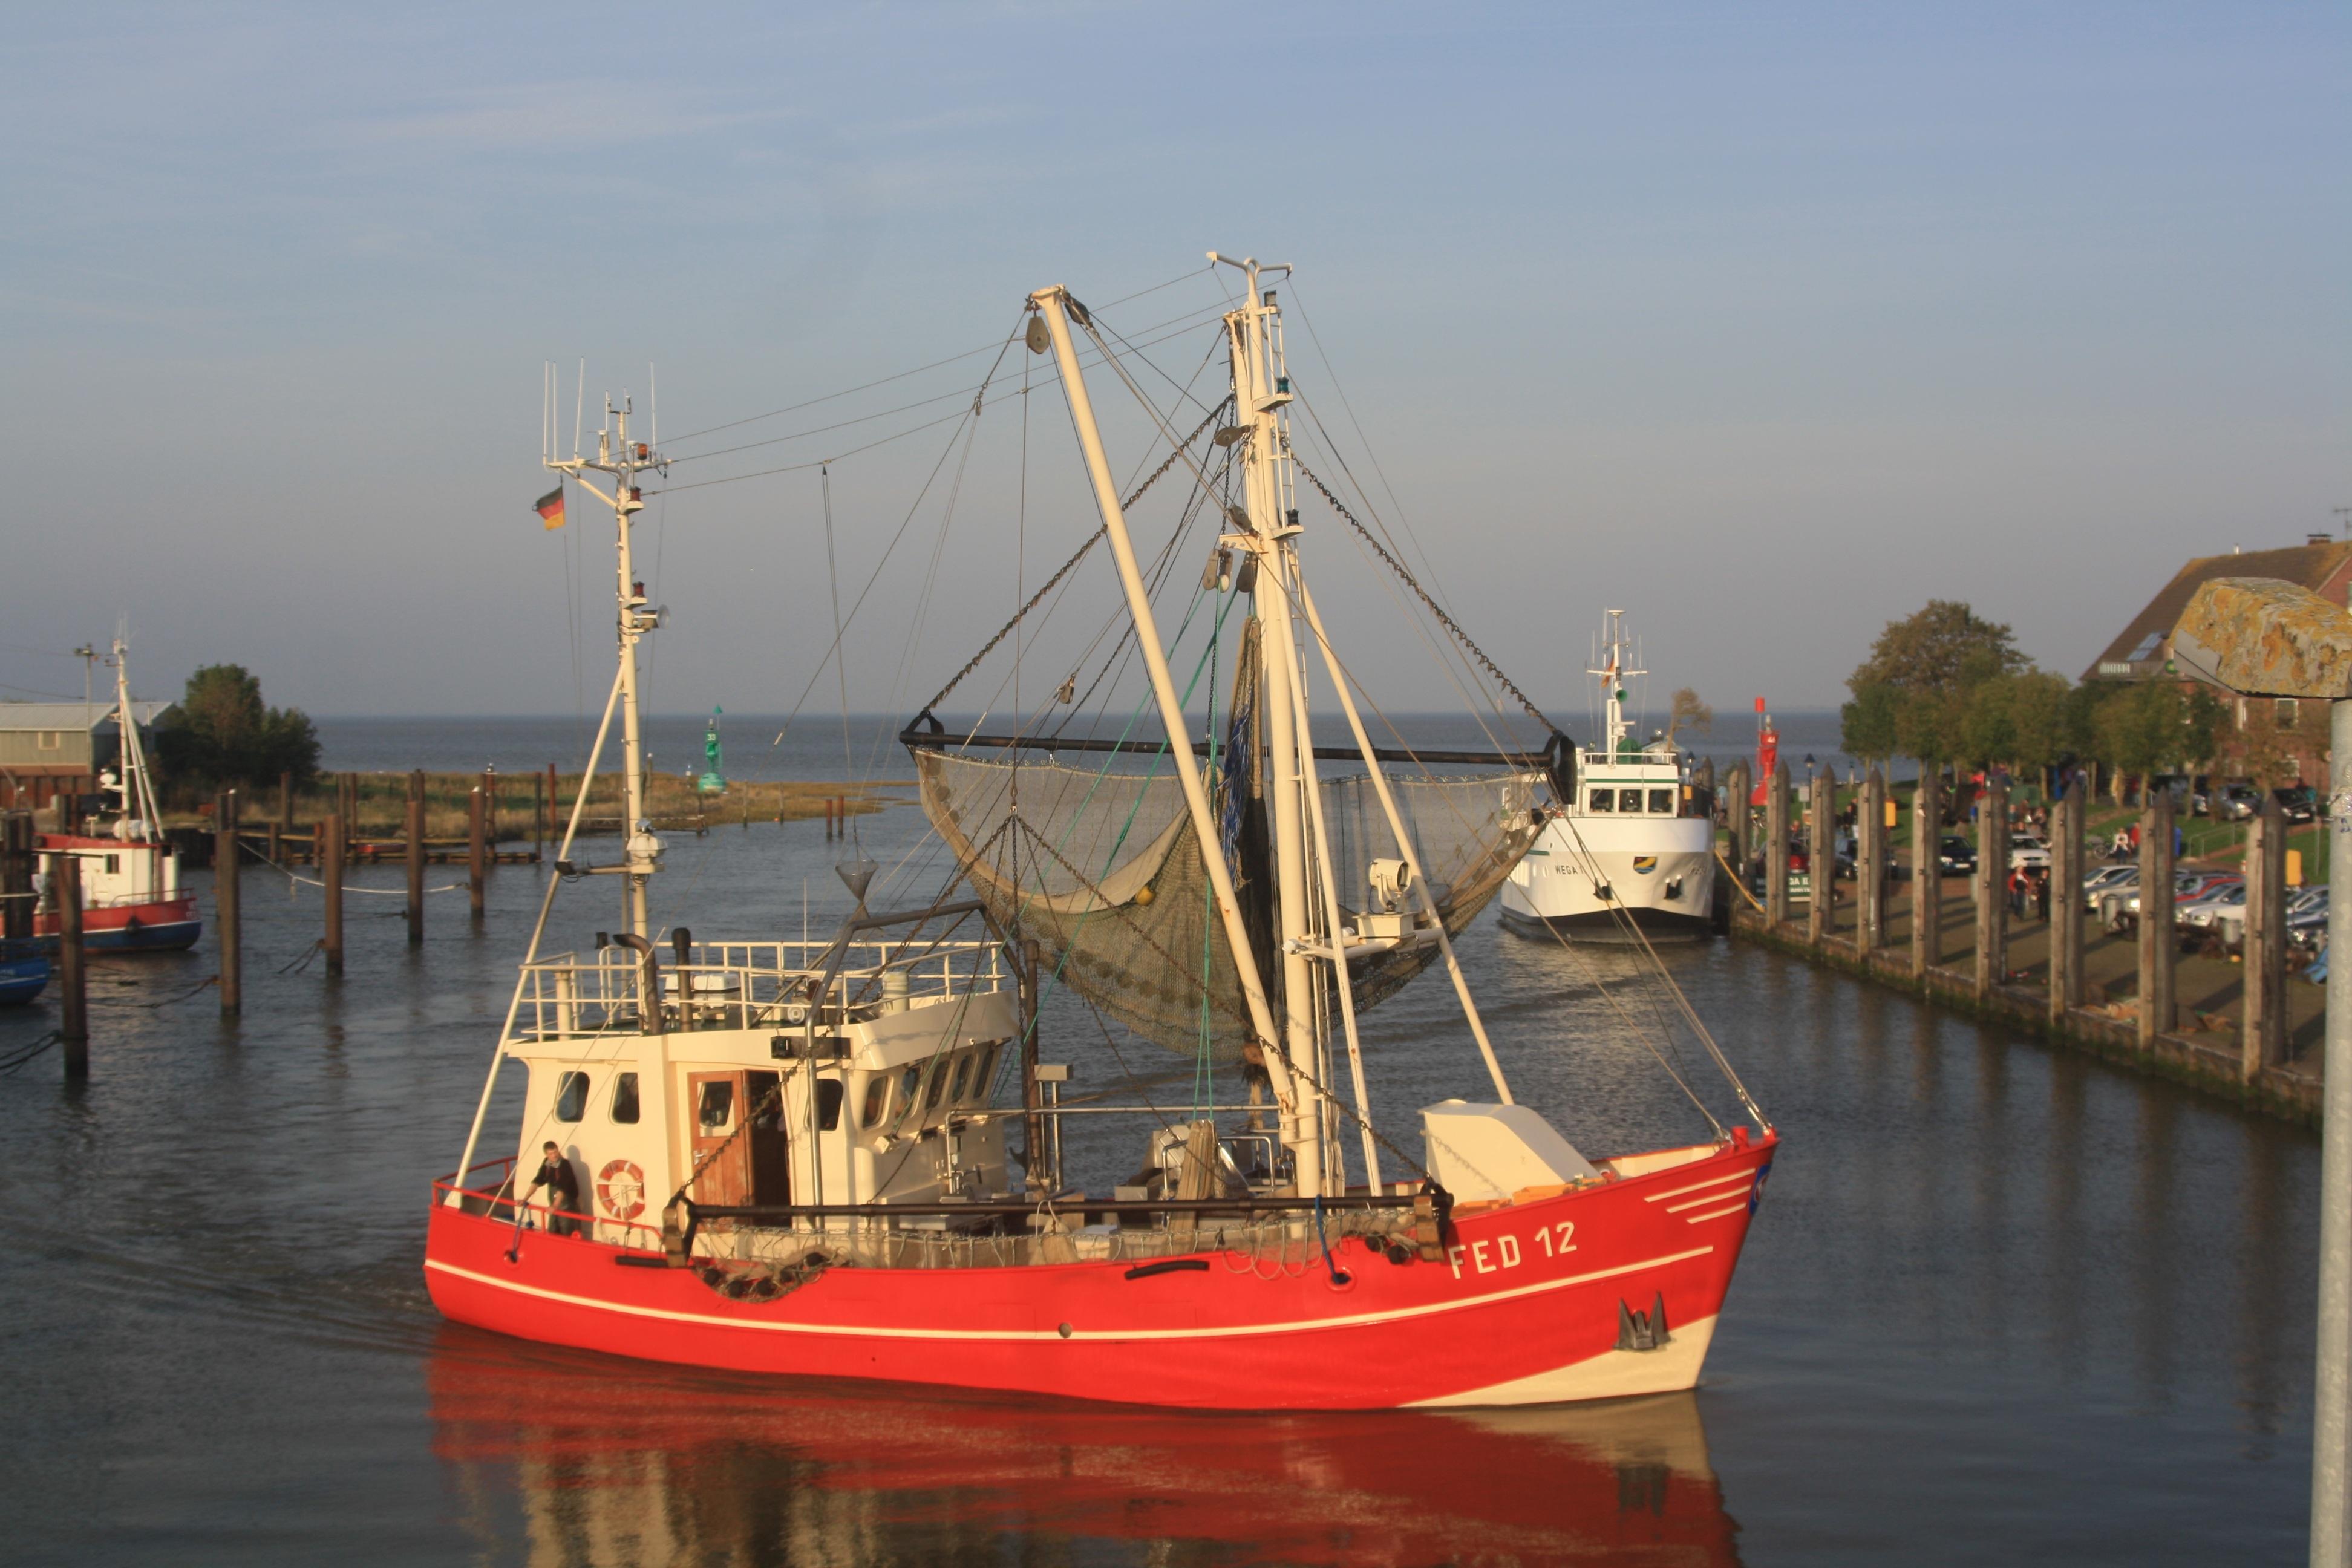 Free Images : water, boat, boot, vehicle, mast, bay, harbor, waterway, shrimp, docks, boating ...